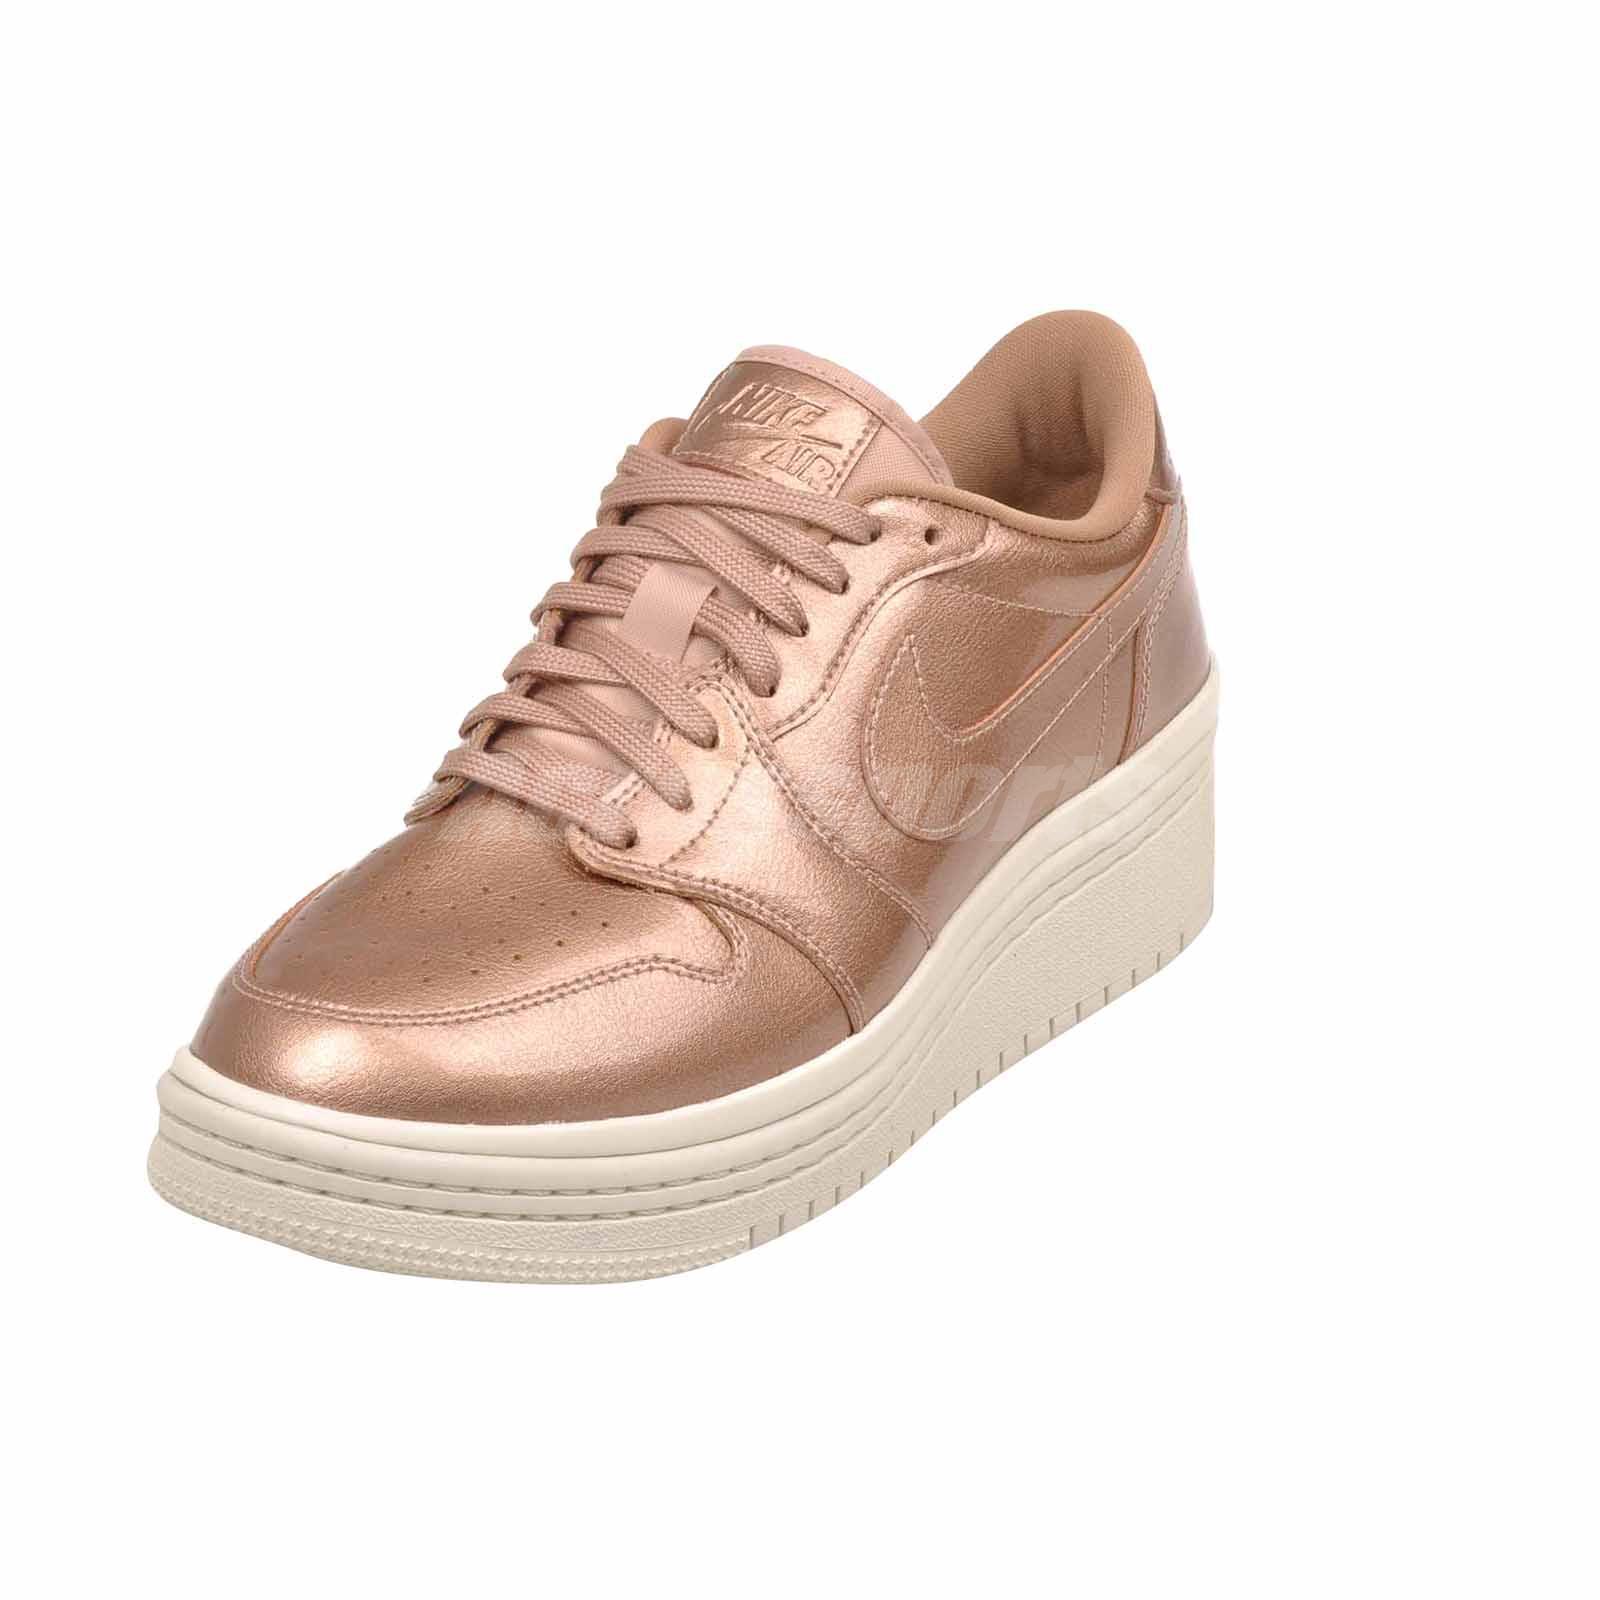 ca58dbb47107 Nike Wmns Air Jordan 1 Retro Low Lifted Casual Womens Shoes AO1334 ...